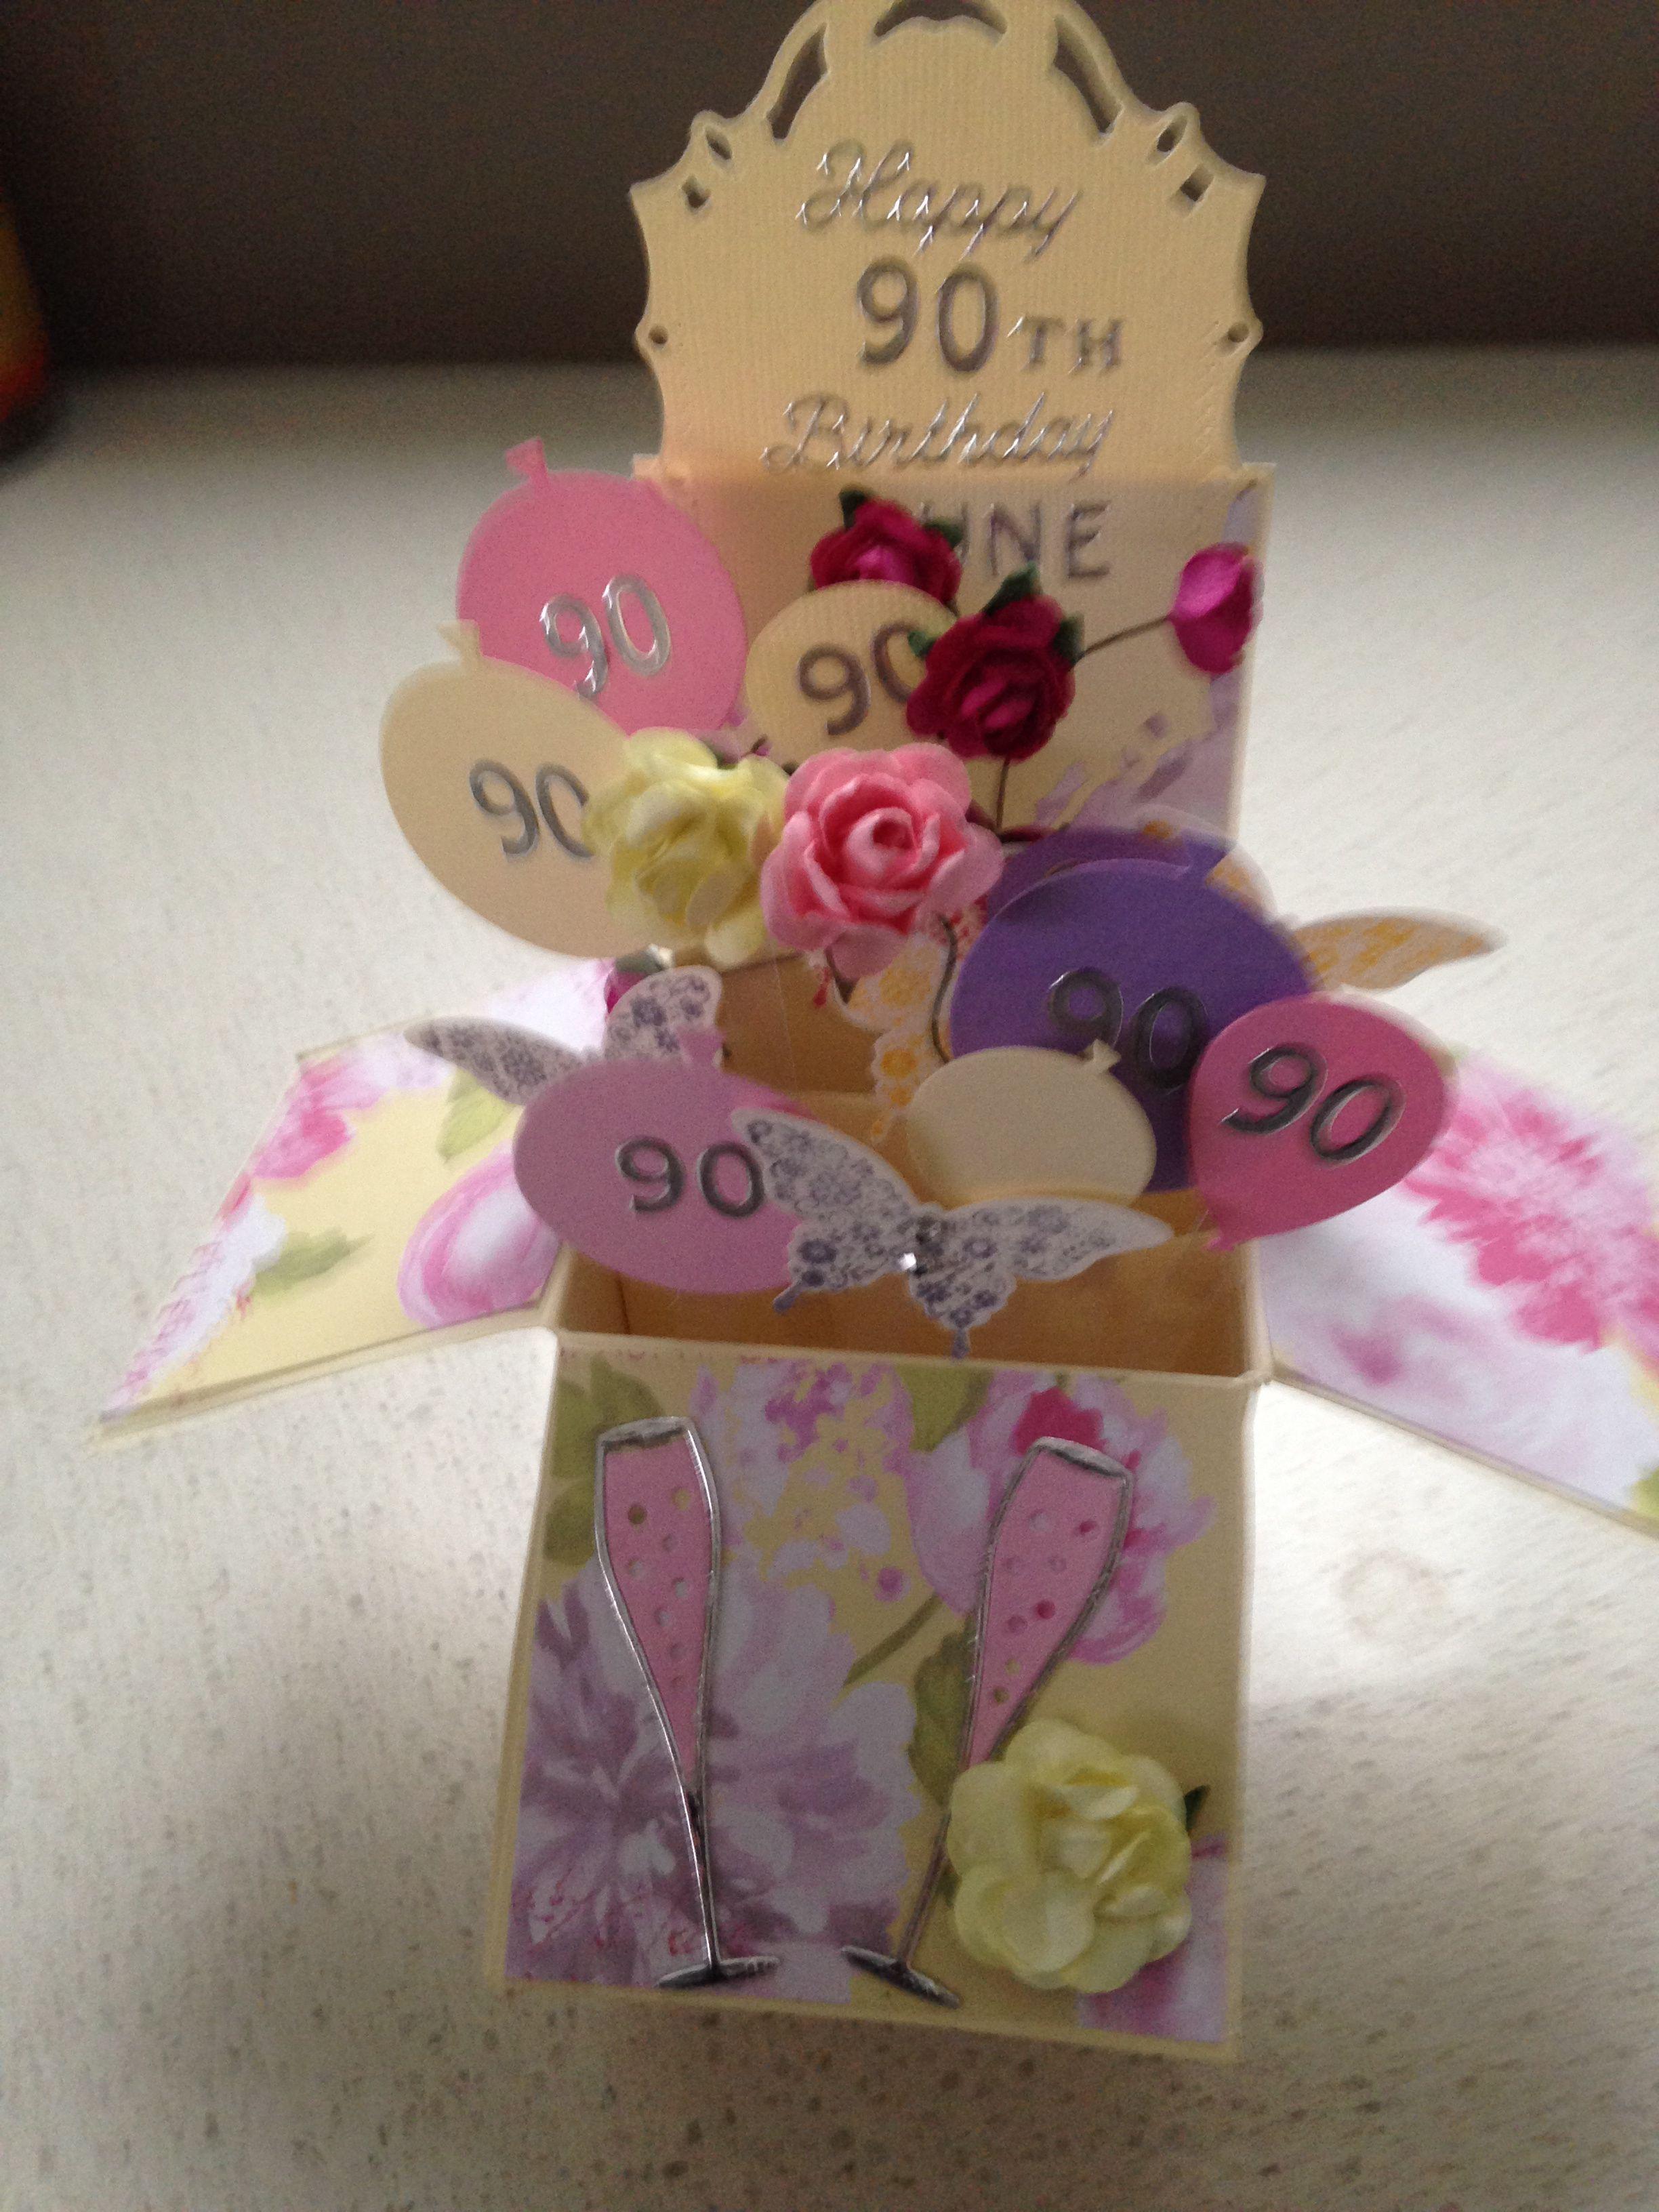 90th Birthday Pop Up Box For Friend 90th Birthday Gifts 80th Birthday Gifts Happy 90th Birthday